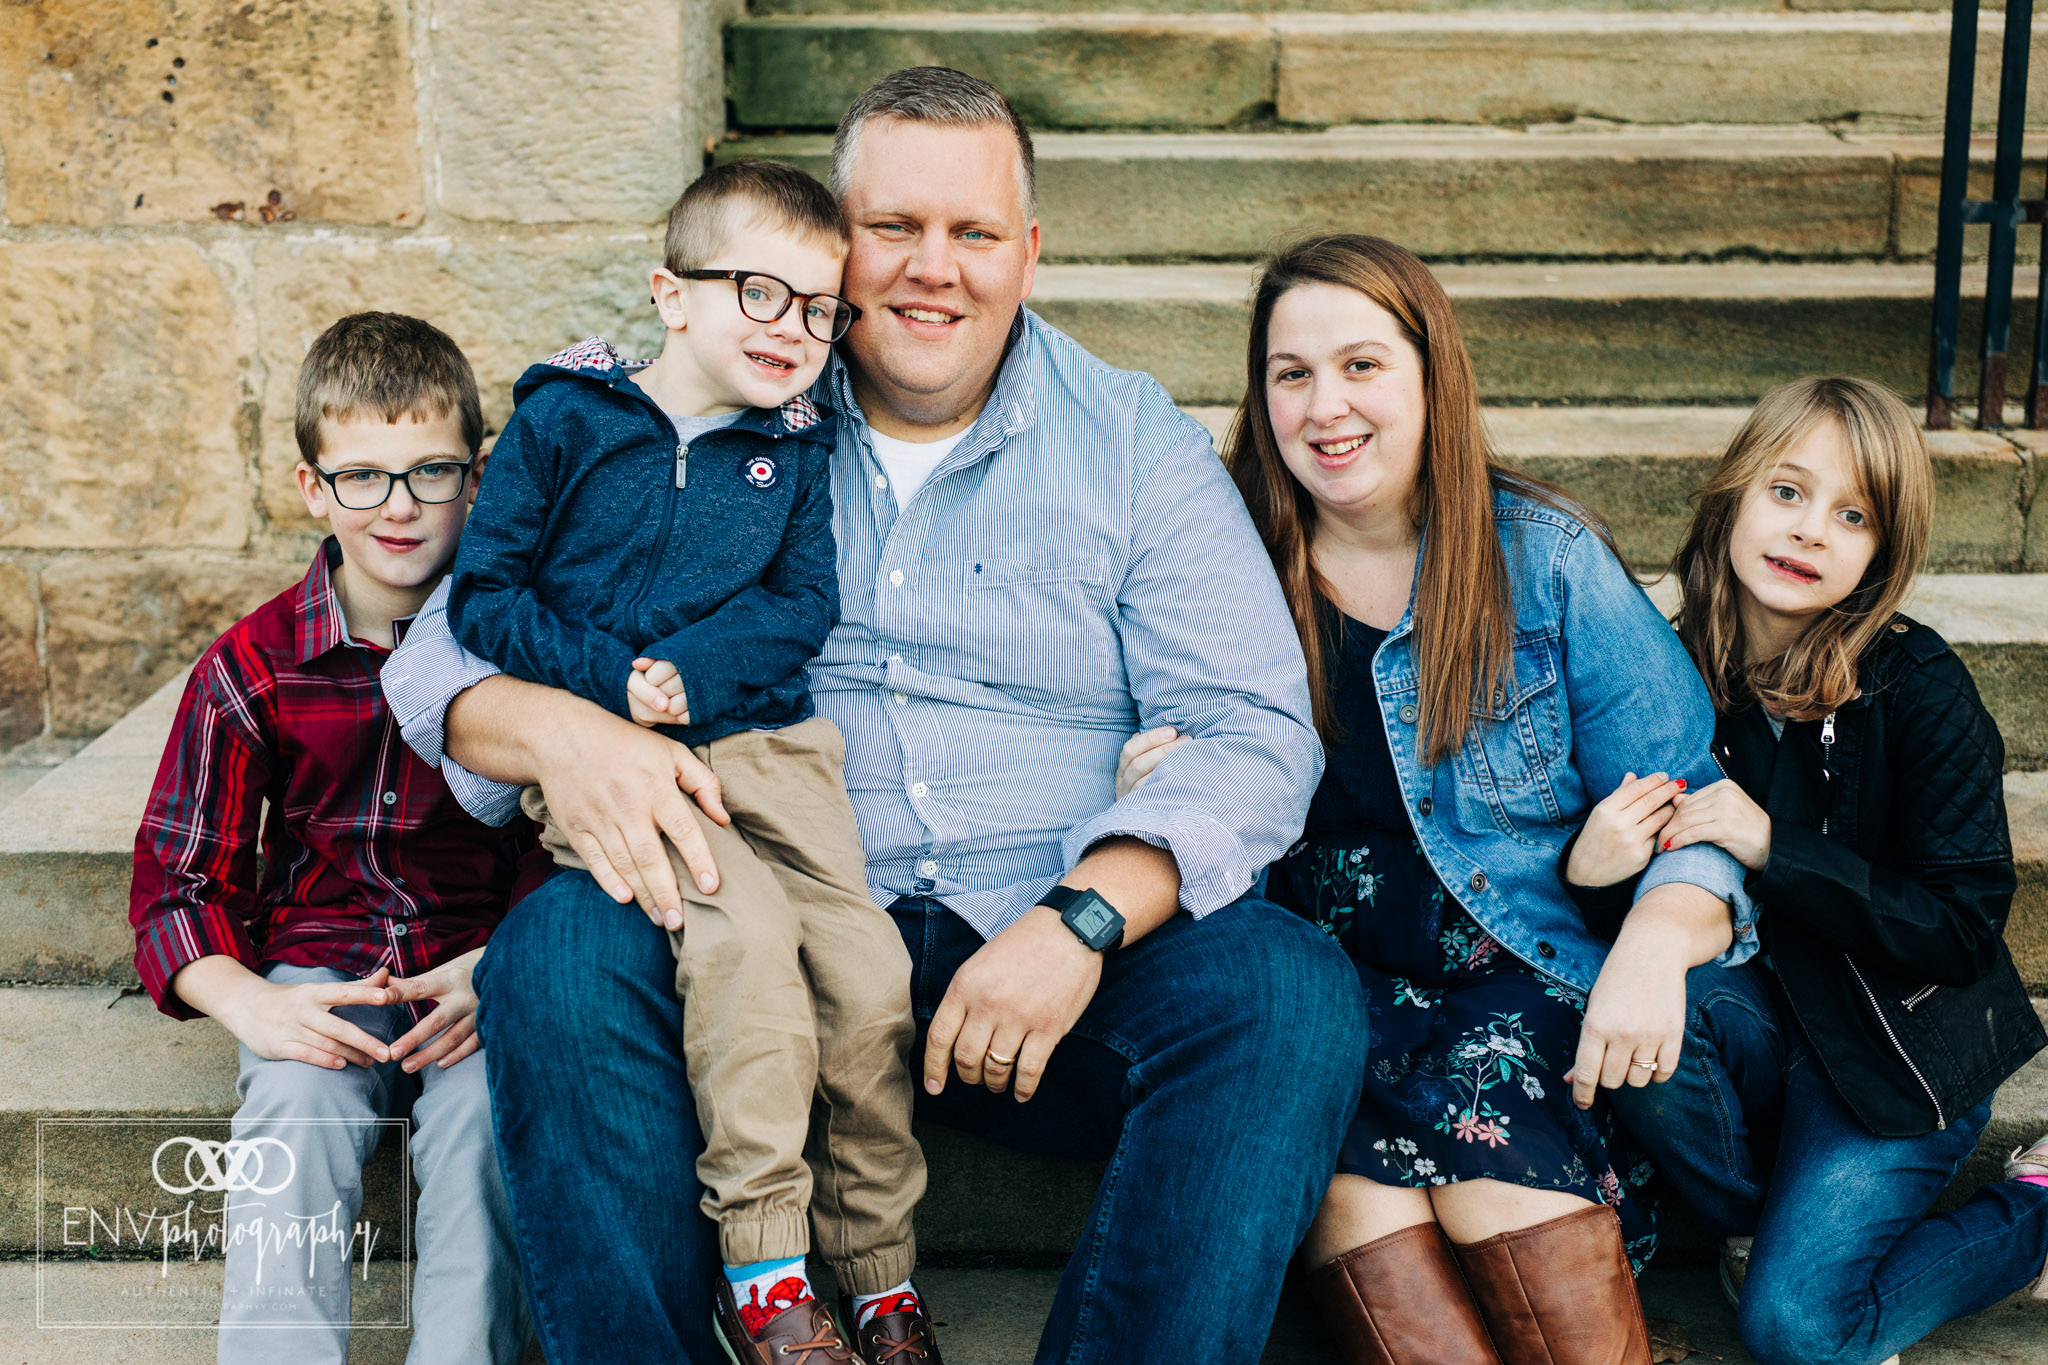 kenyon college columbus ohio fall family photography (11).jpg